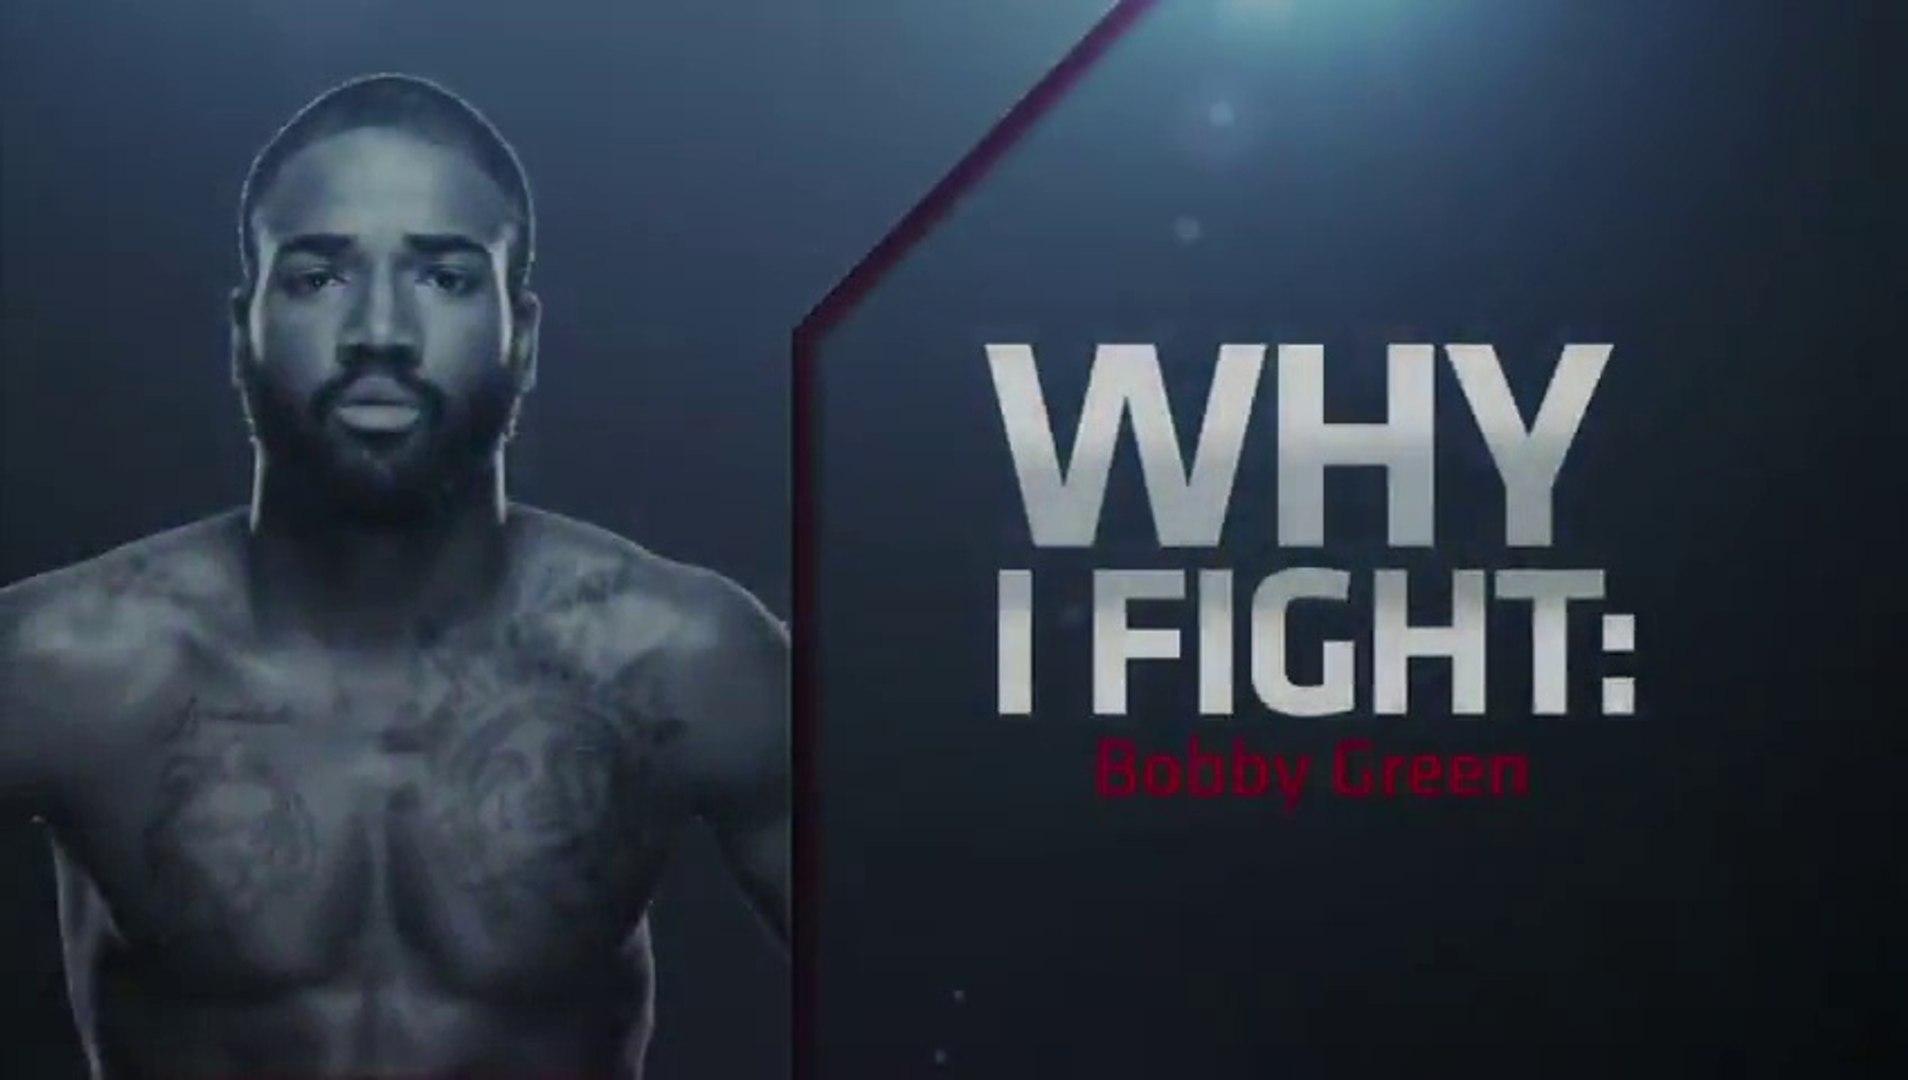 Fight Night Austin: Why I Fight - Bobby Green